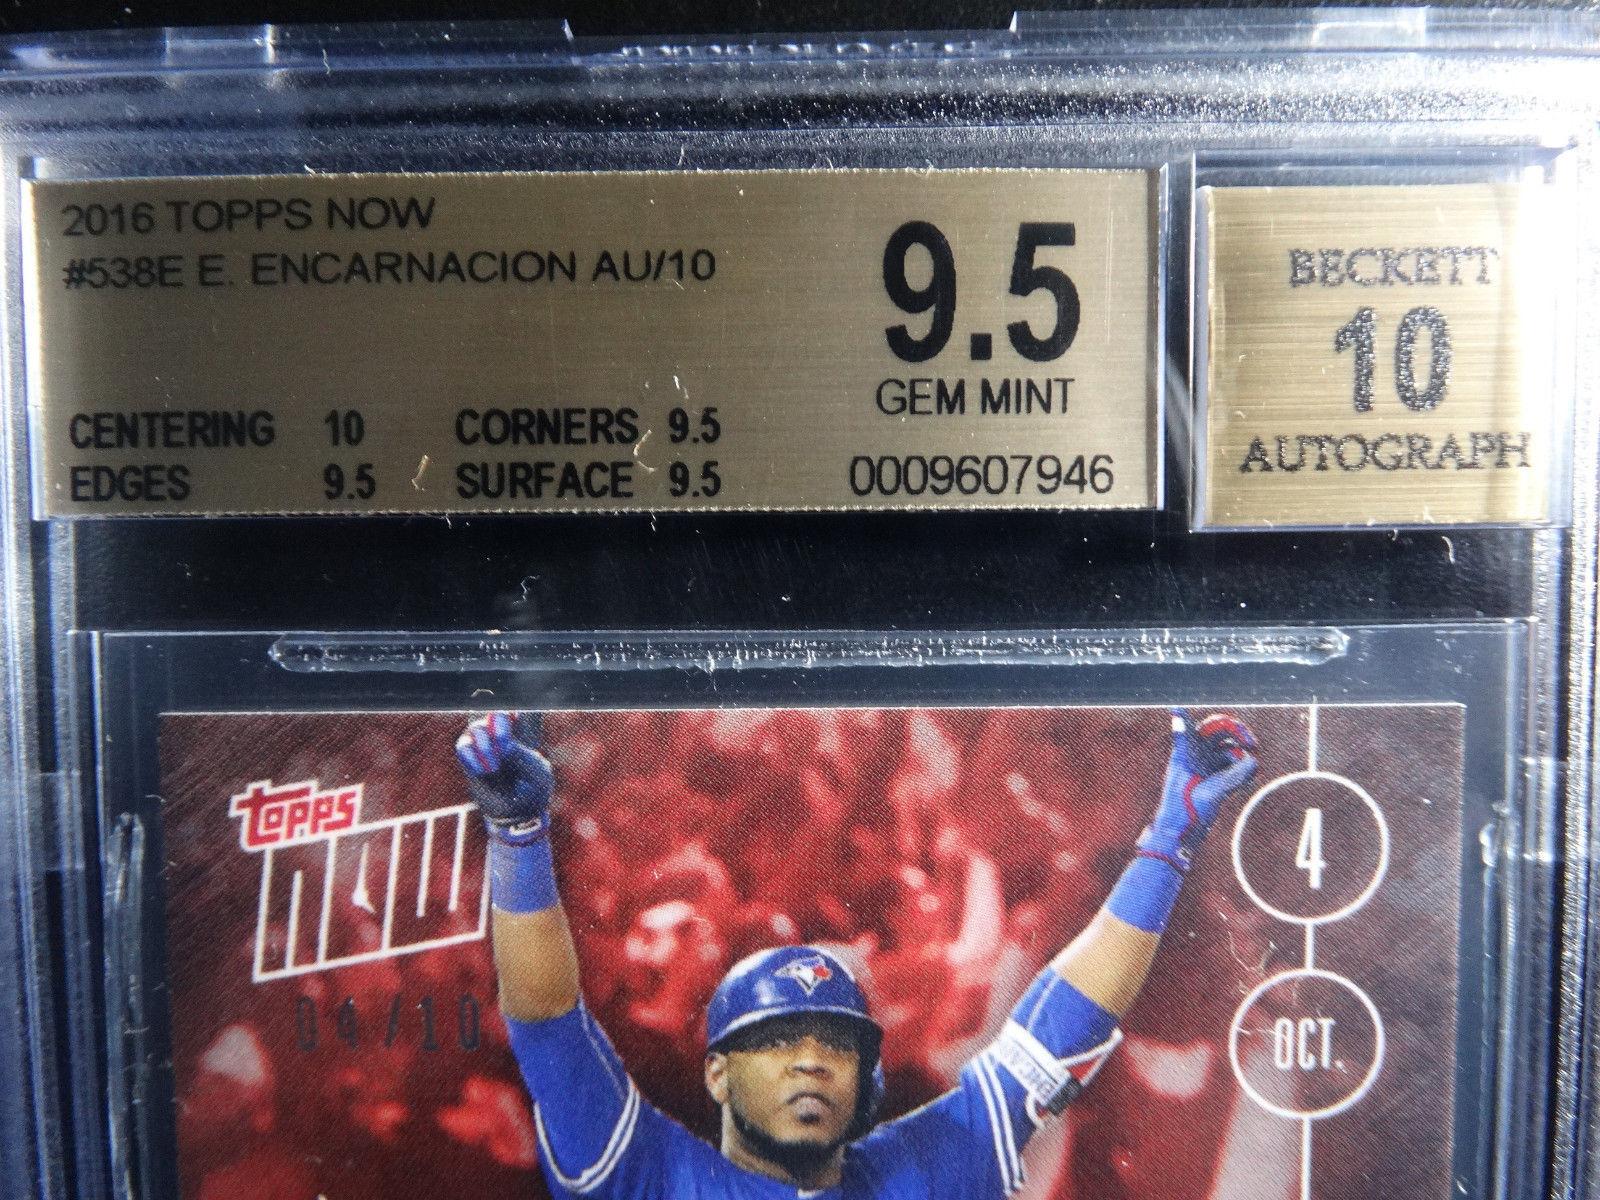 2016 Topps Now #538E Edwin Encarnacion Walk Off Blue Jays Auto Card BGS 9.5 4/10